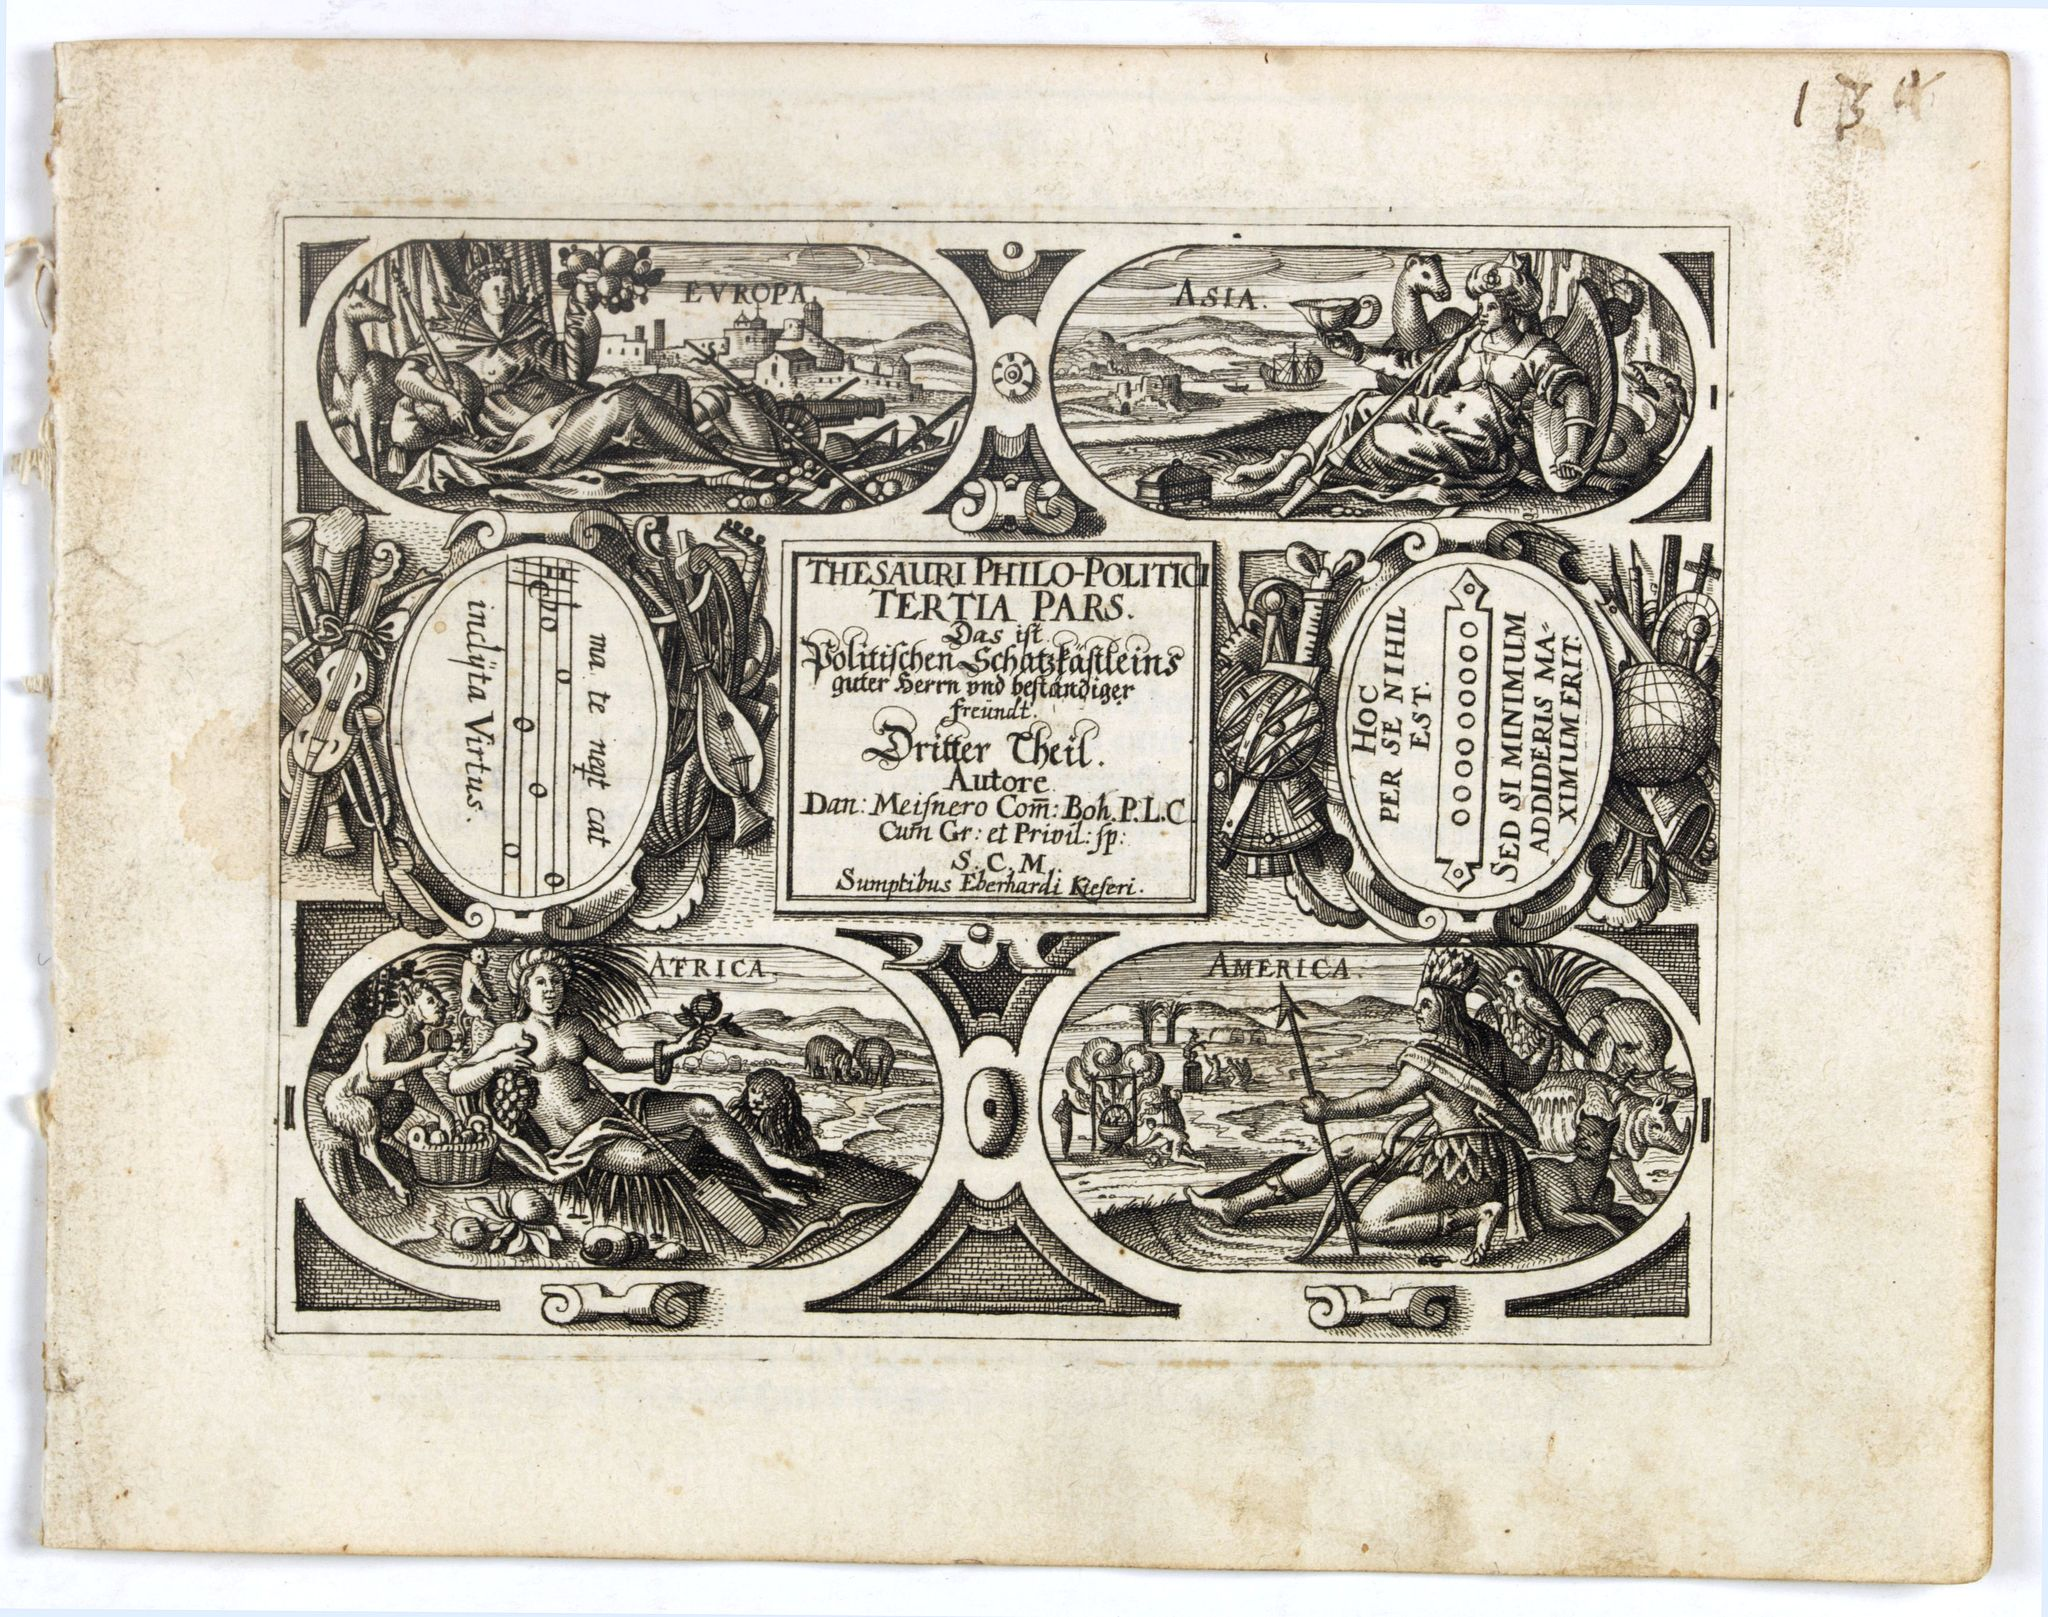 MEISNER, D. -  [Title page] Thesauri Philo Polithi Tertia pars..